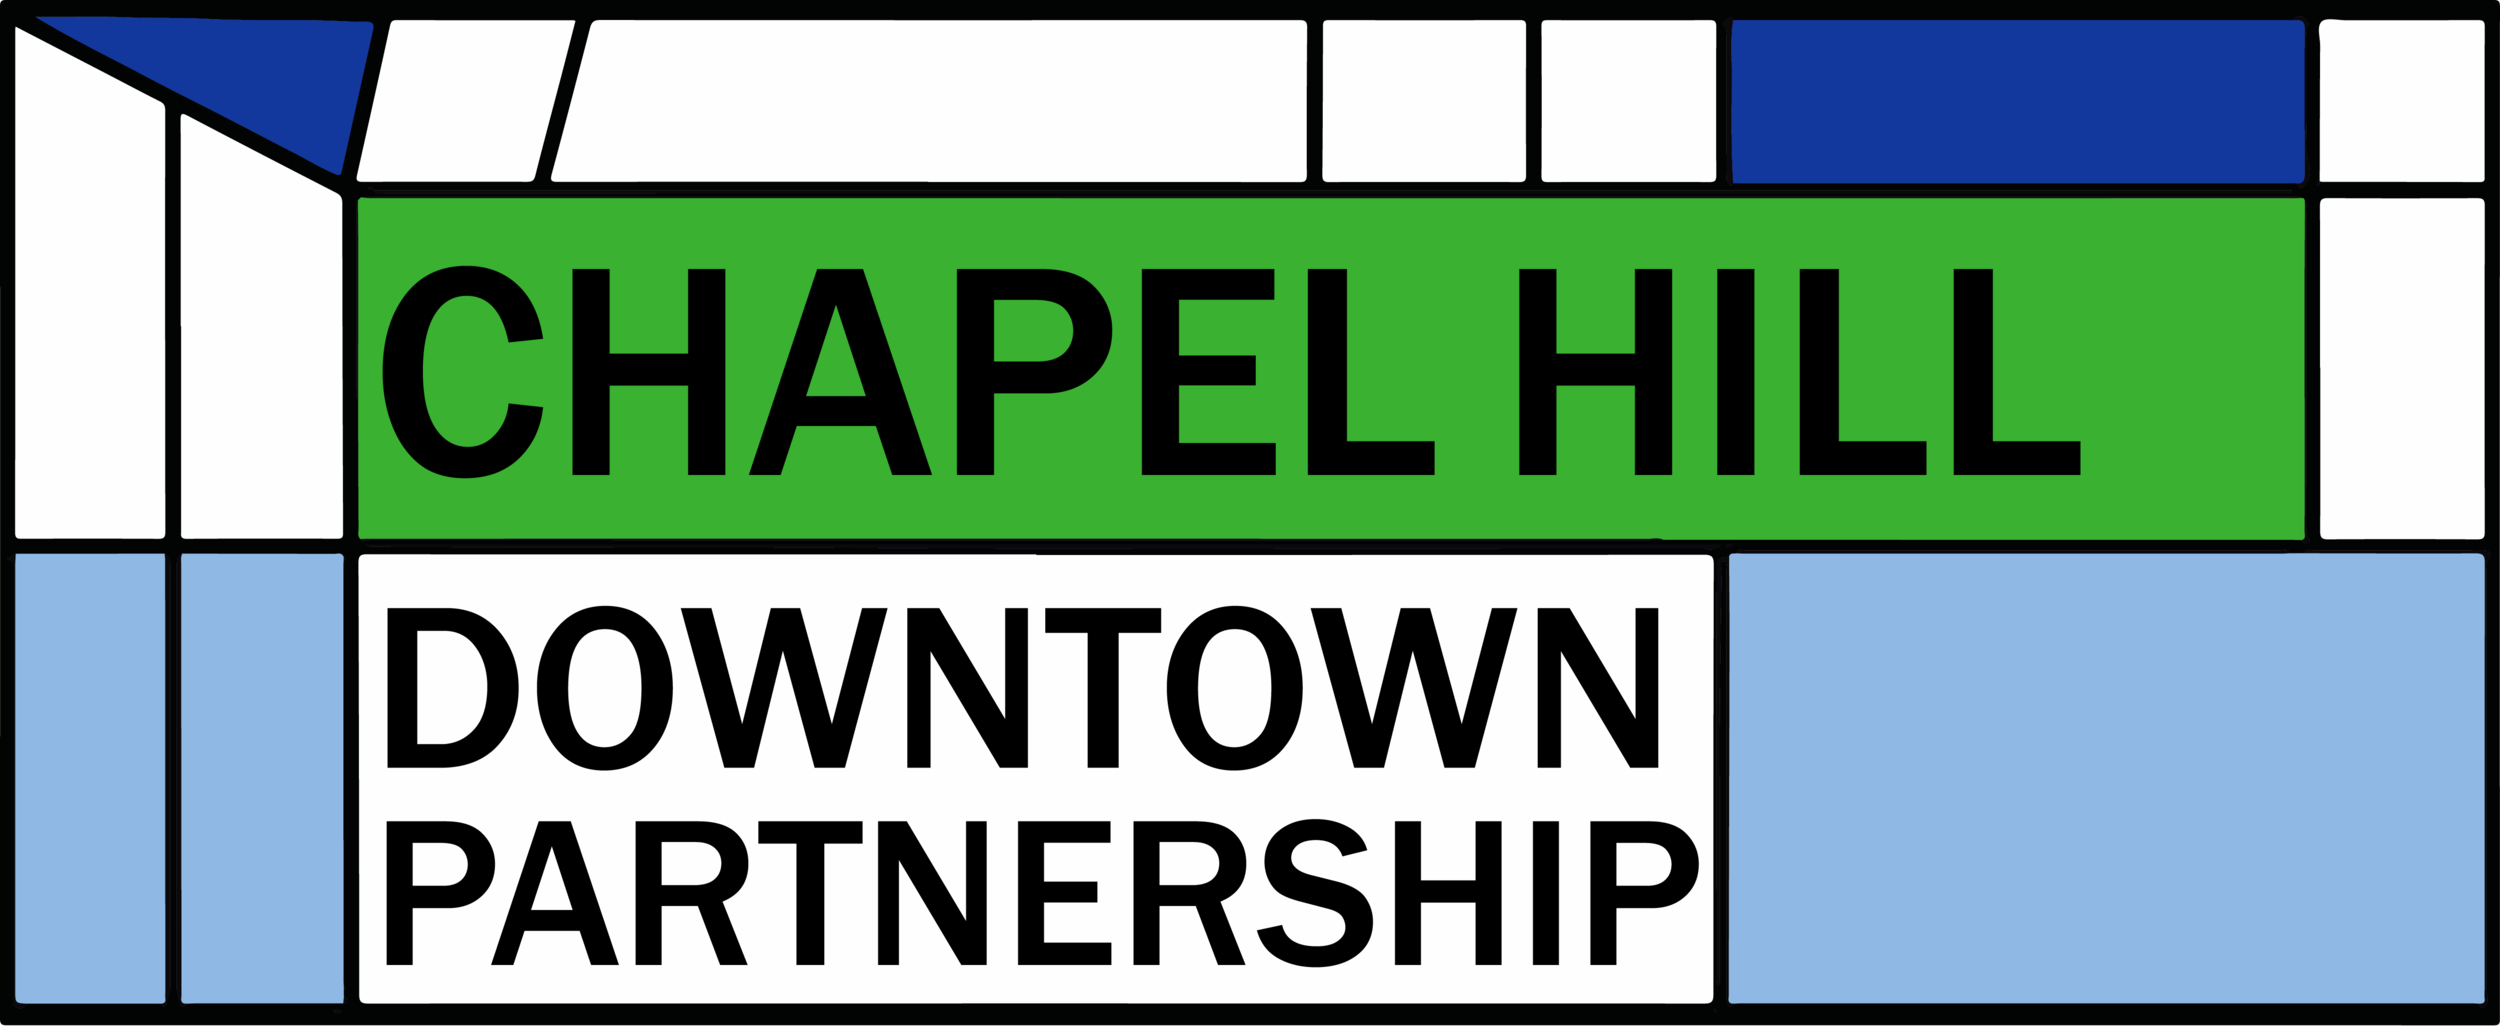 Downtown Partnership Logo.png